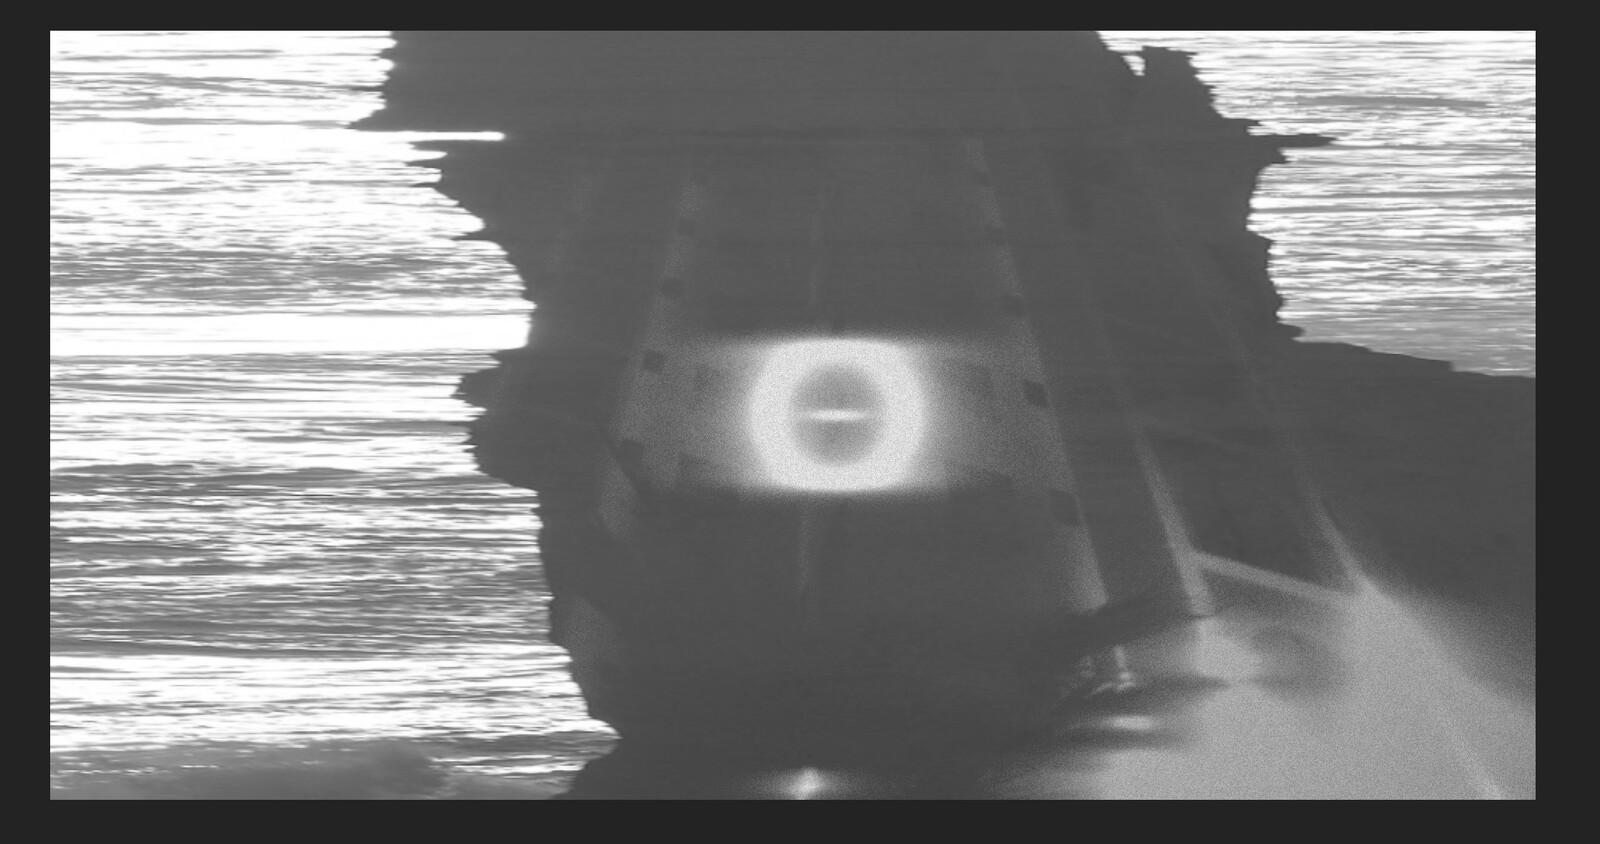 STOCK Footage (SET01]